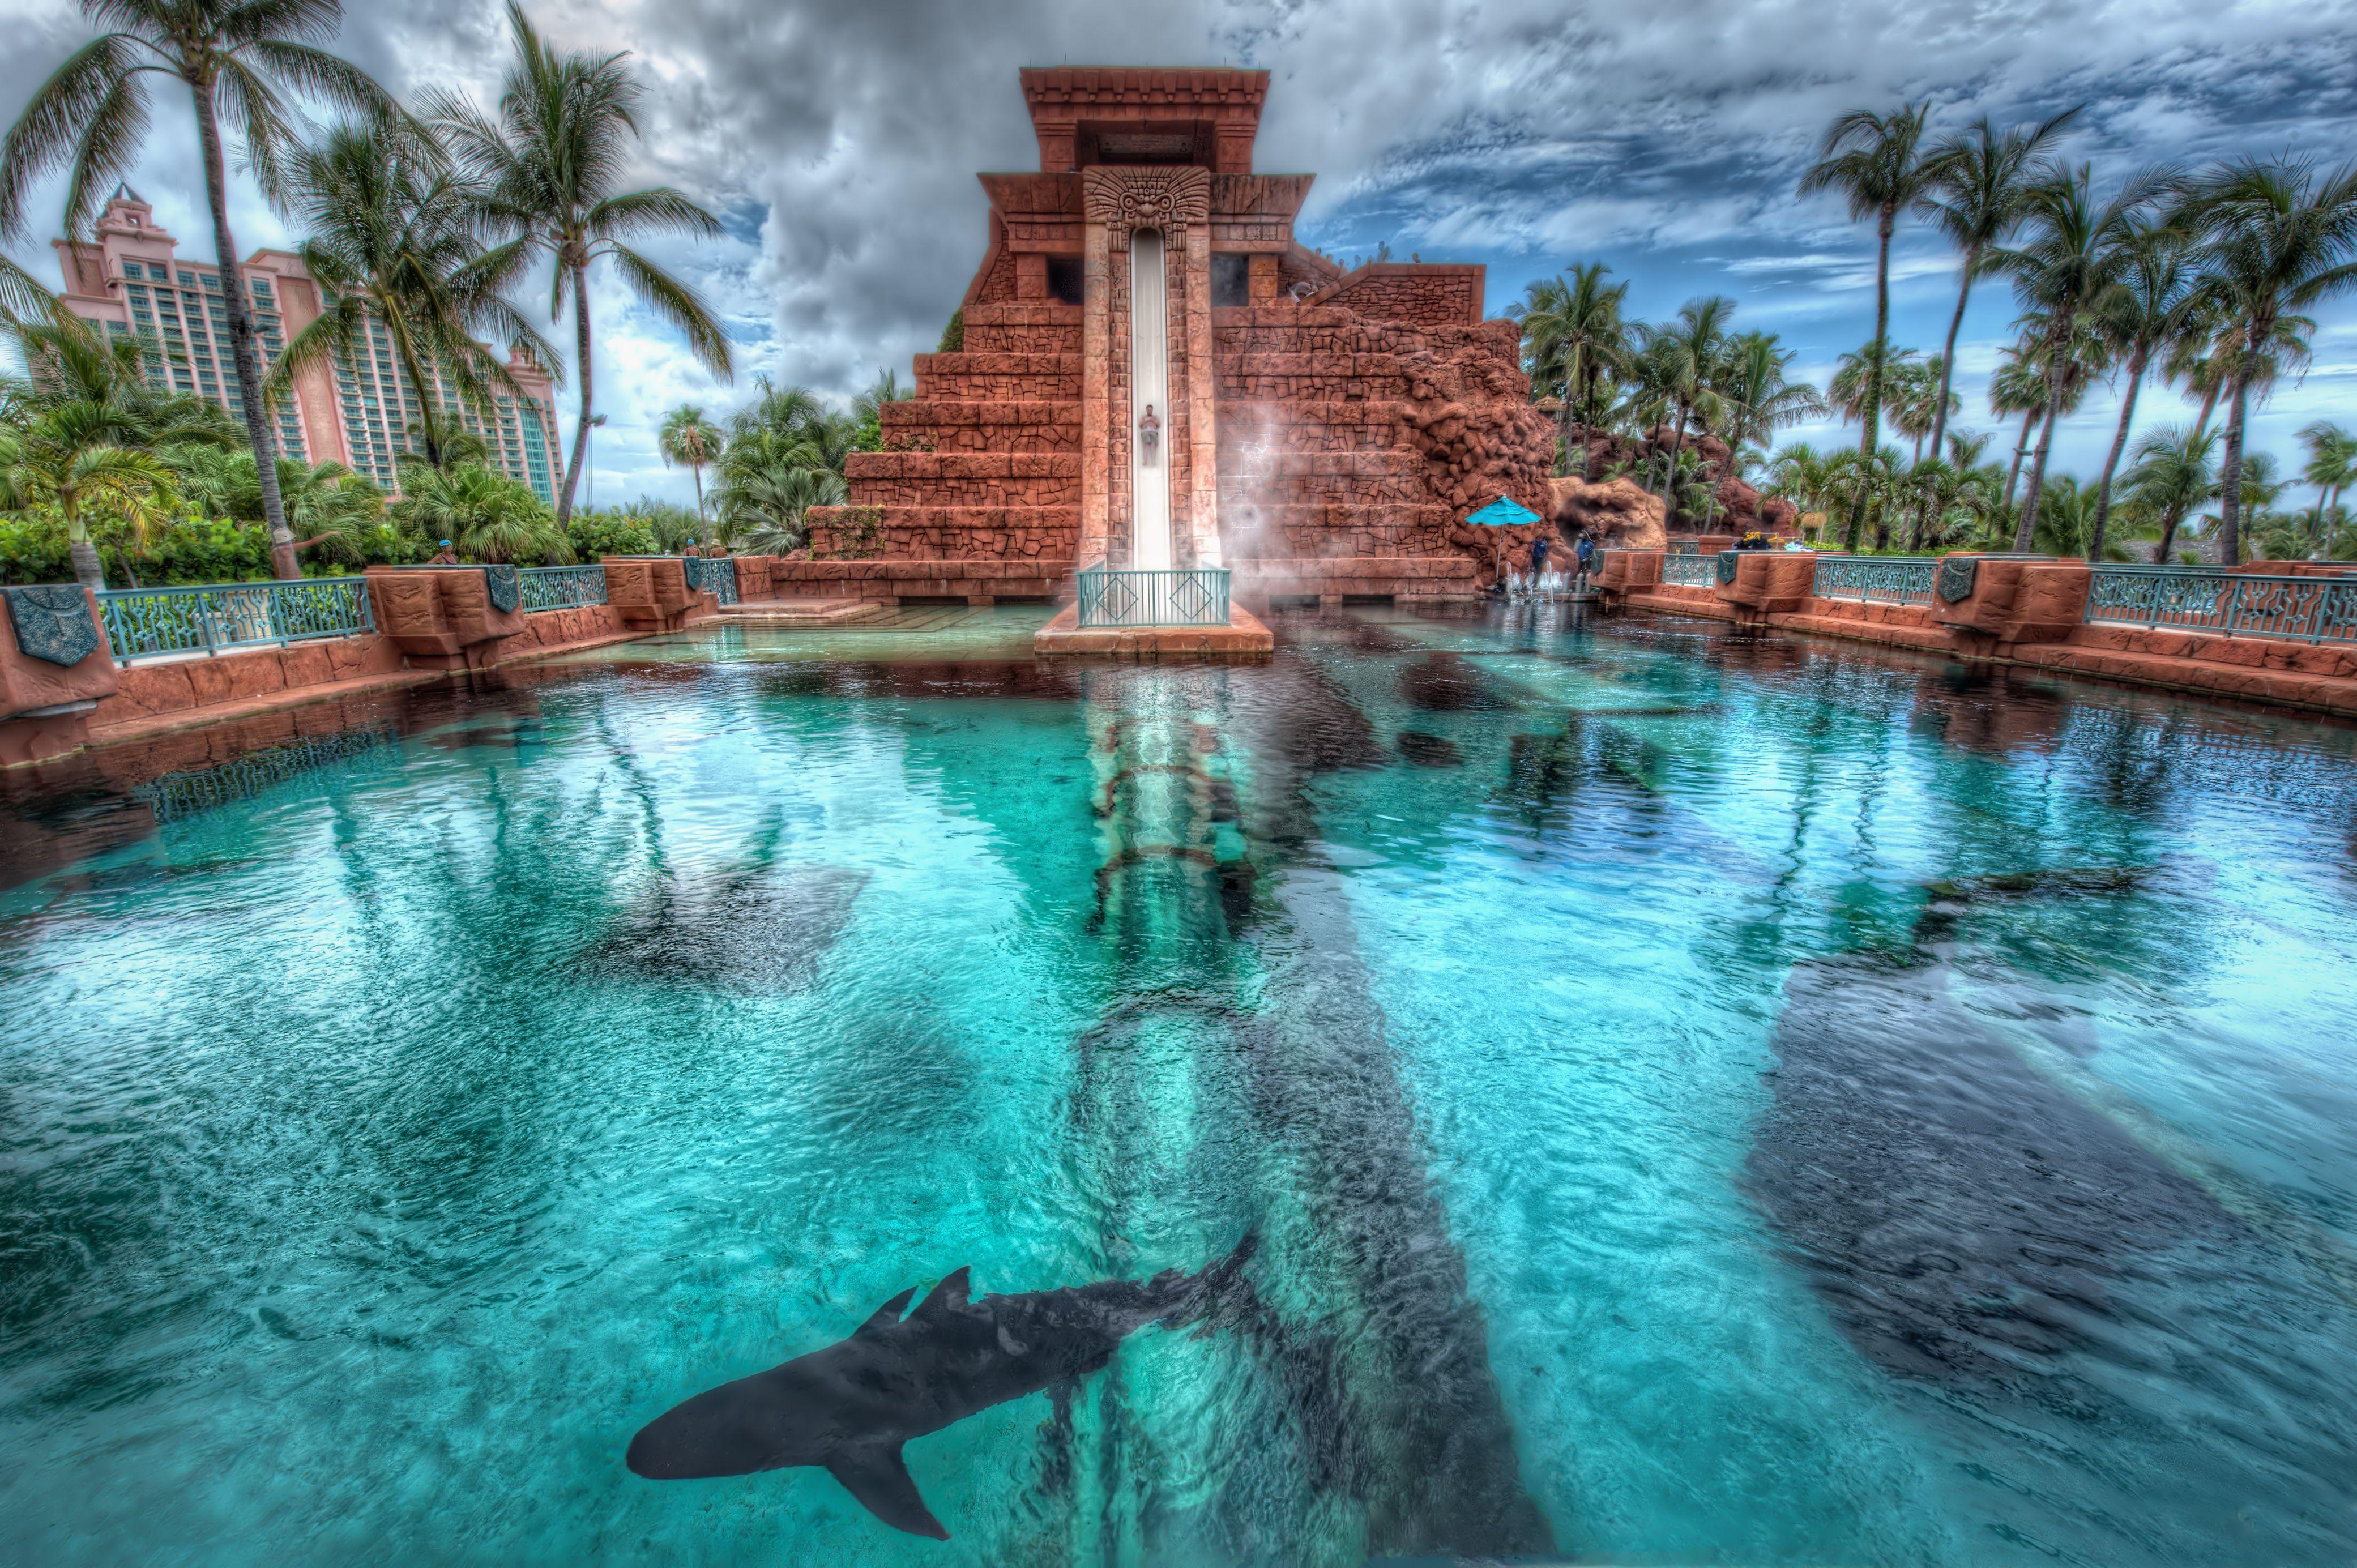 Bahamas Desktop Wallpapers Top Free Bahamas Desktop Backgrounds Wallpaperaccess Atlantis Resort Bahamas Water Temple Atlantis Bahamas